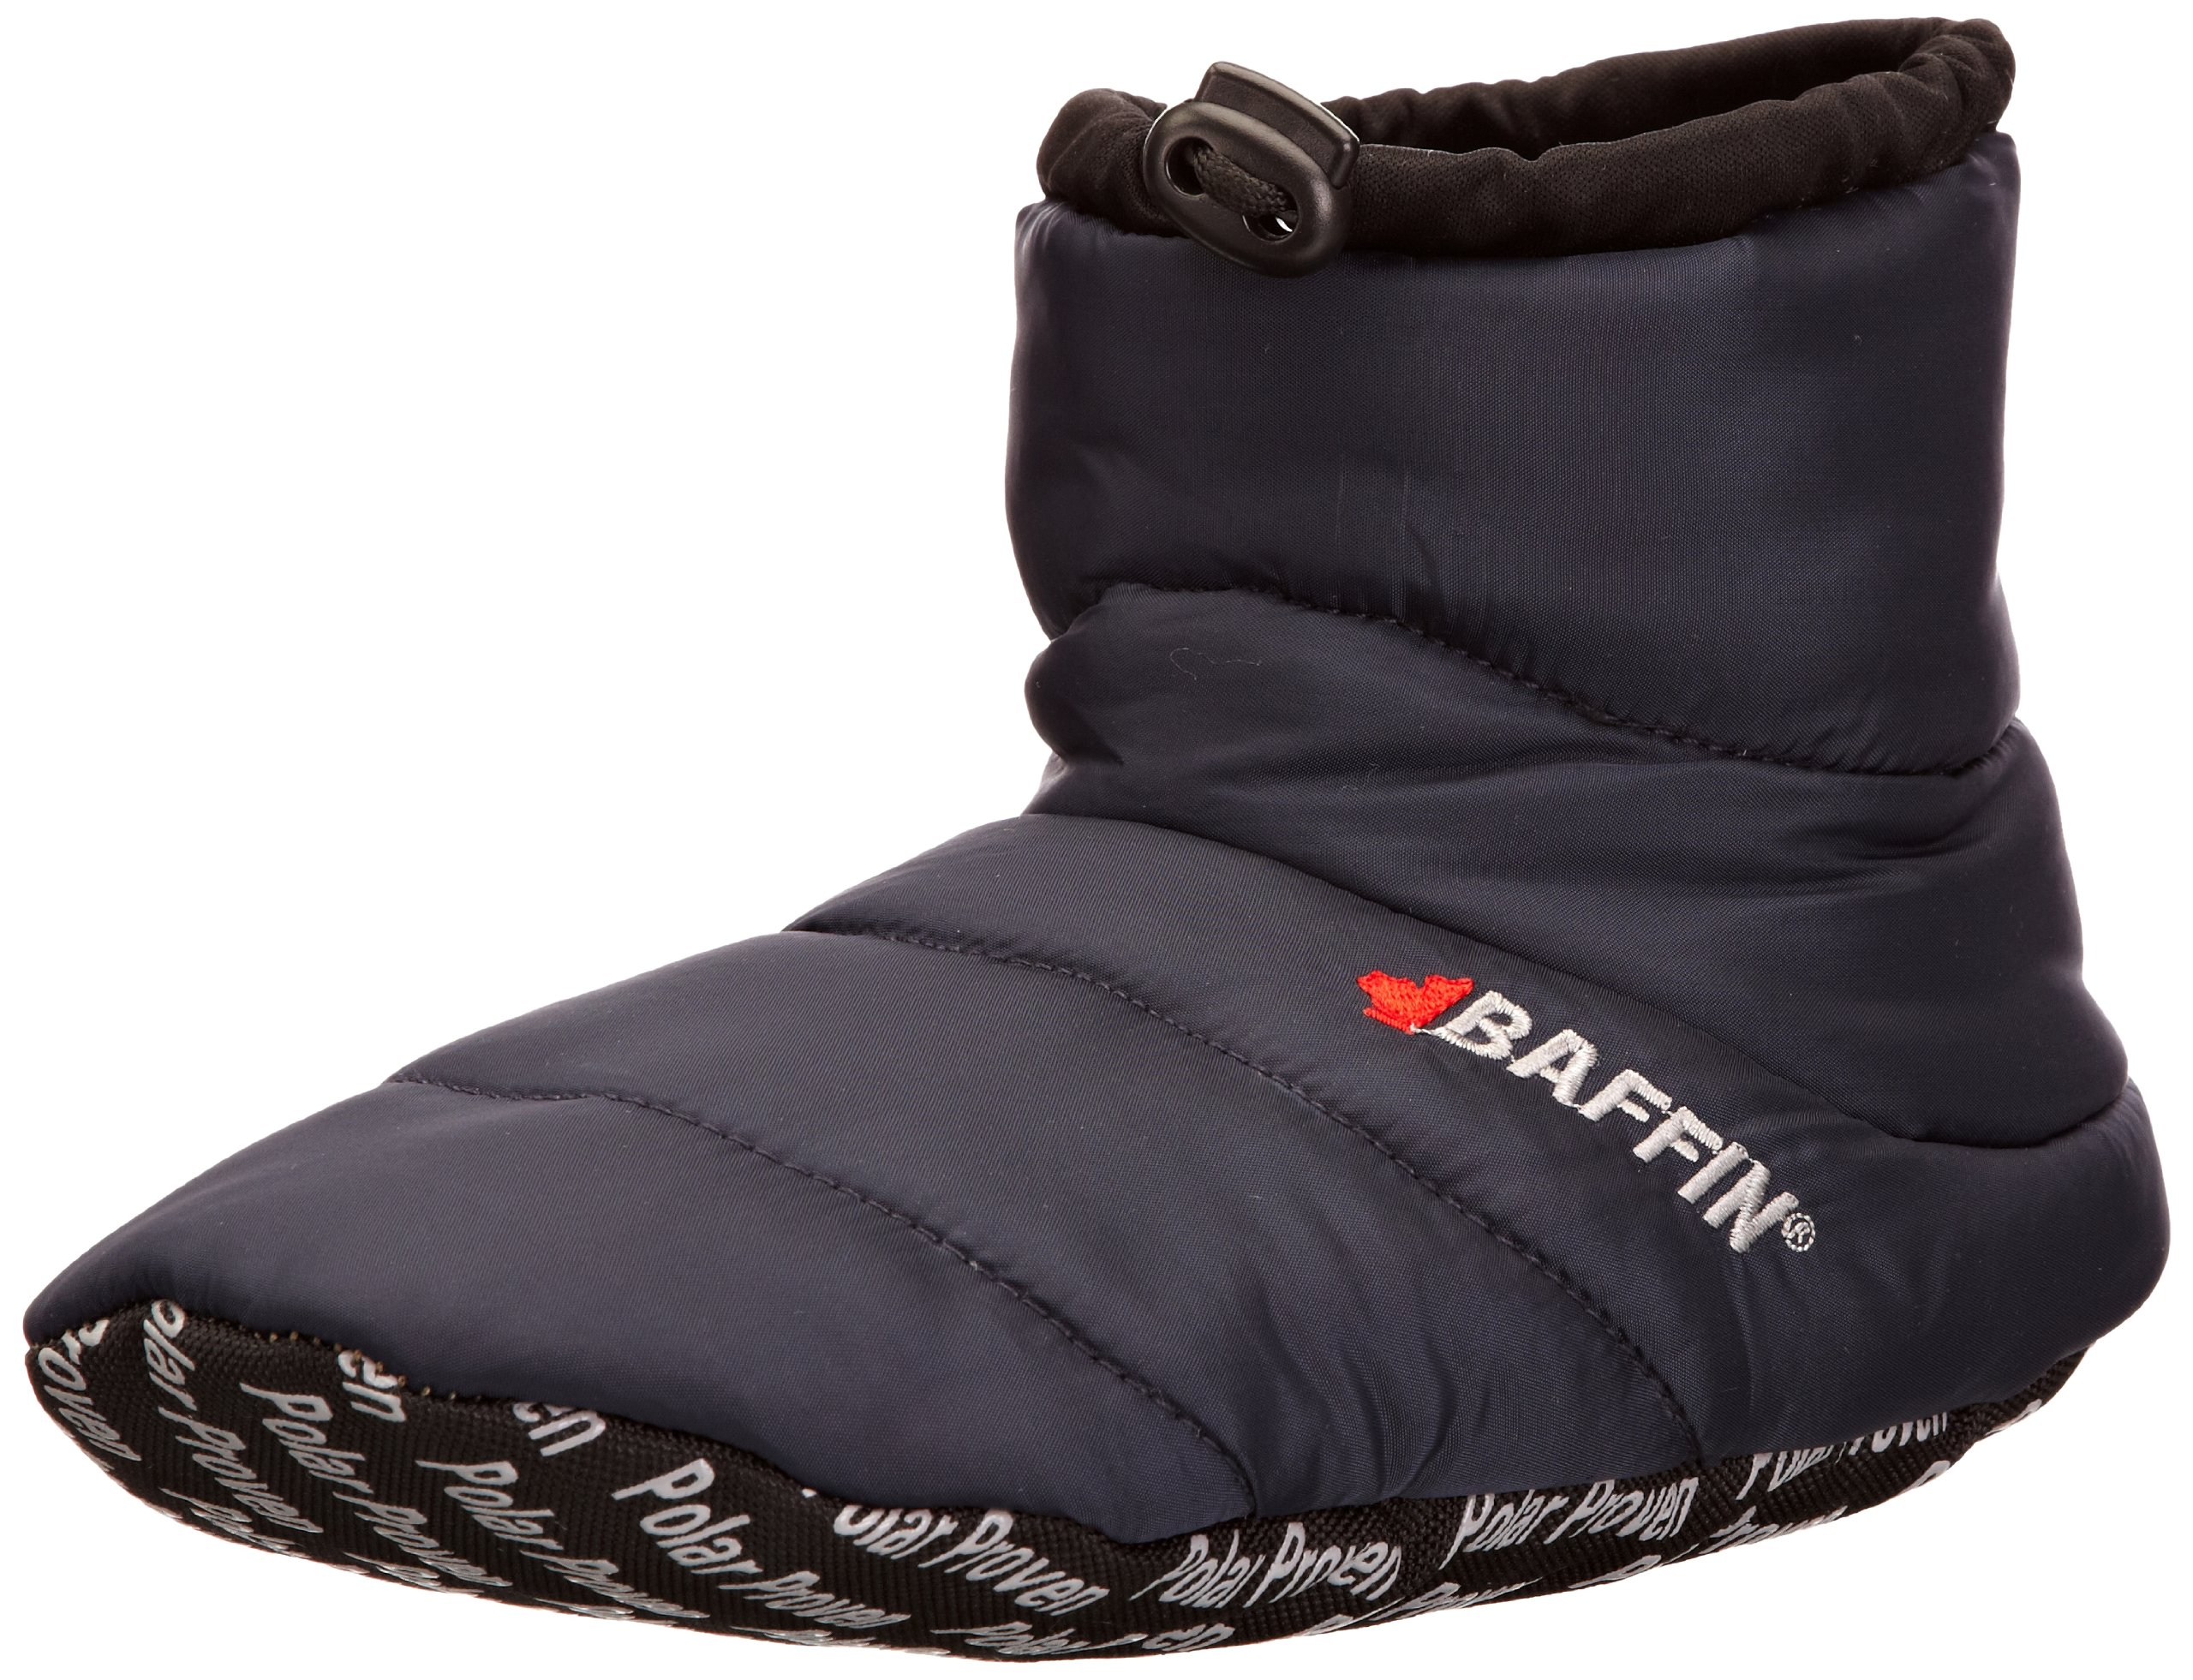 Baffin Unisex Cush Insulated Slipper Booty,Navy,XX-Large (Men's 11-12 M US)